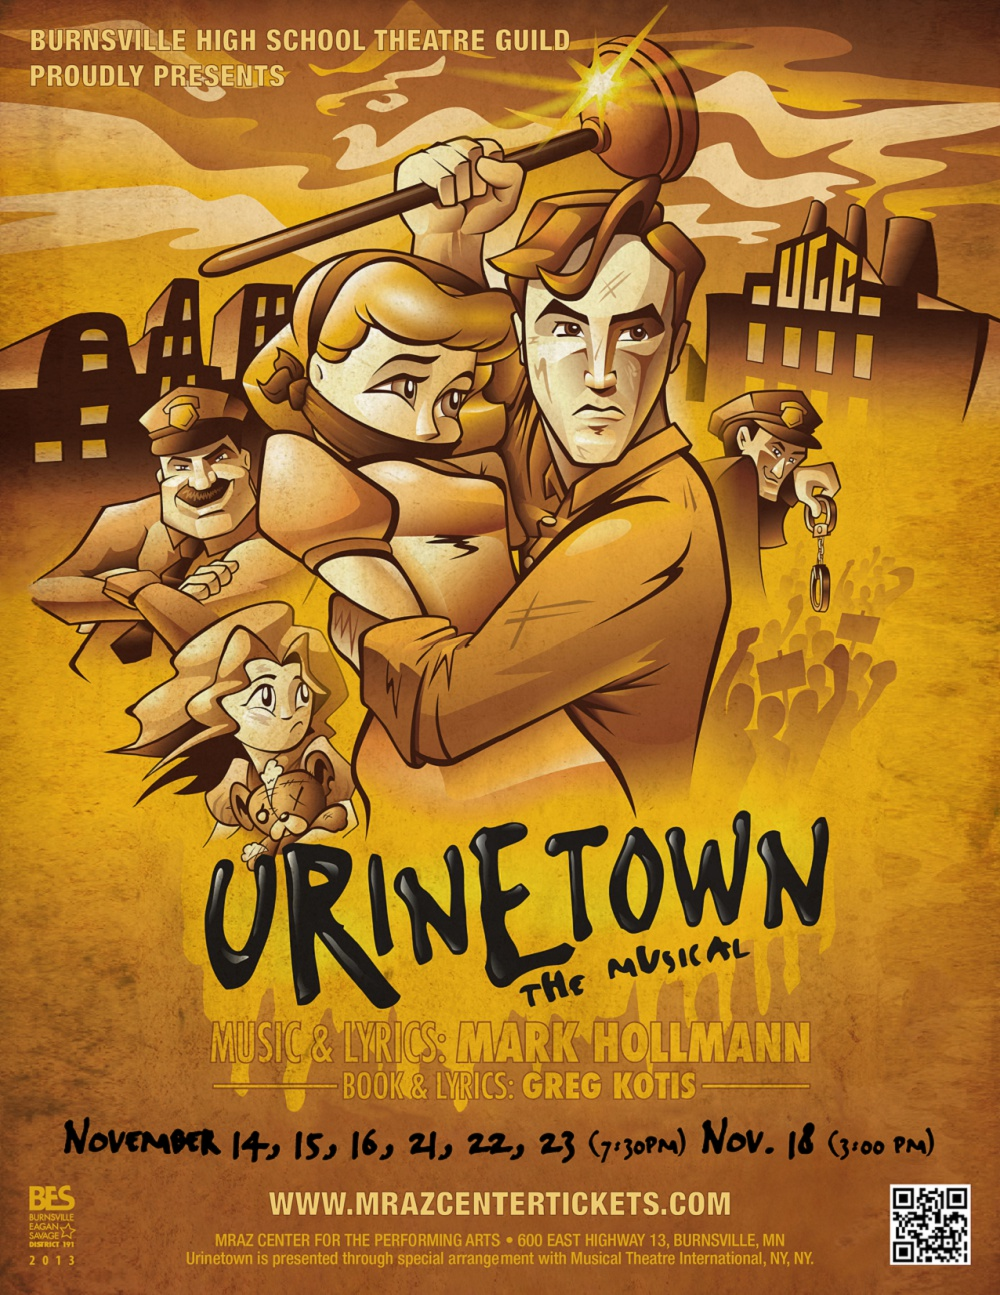 Poster_Urinetown.jpg